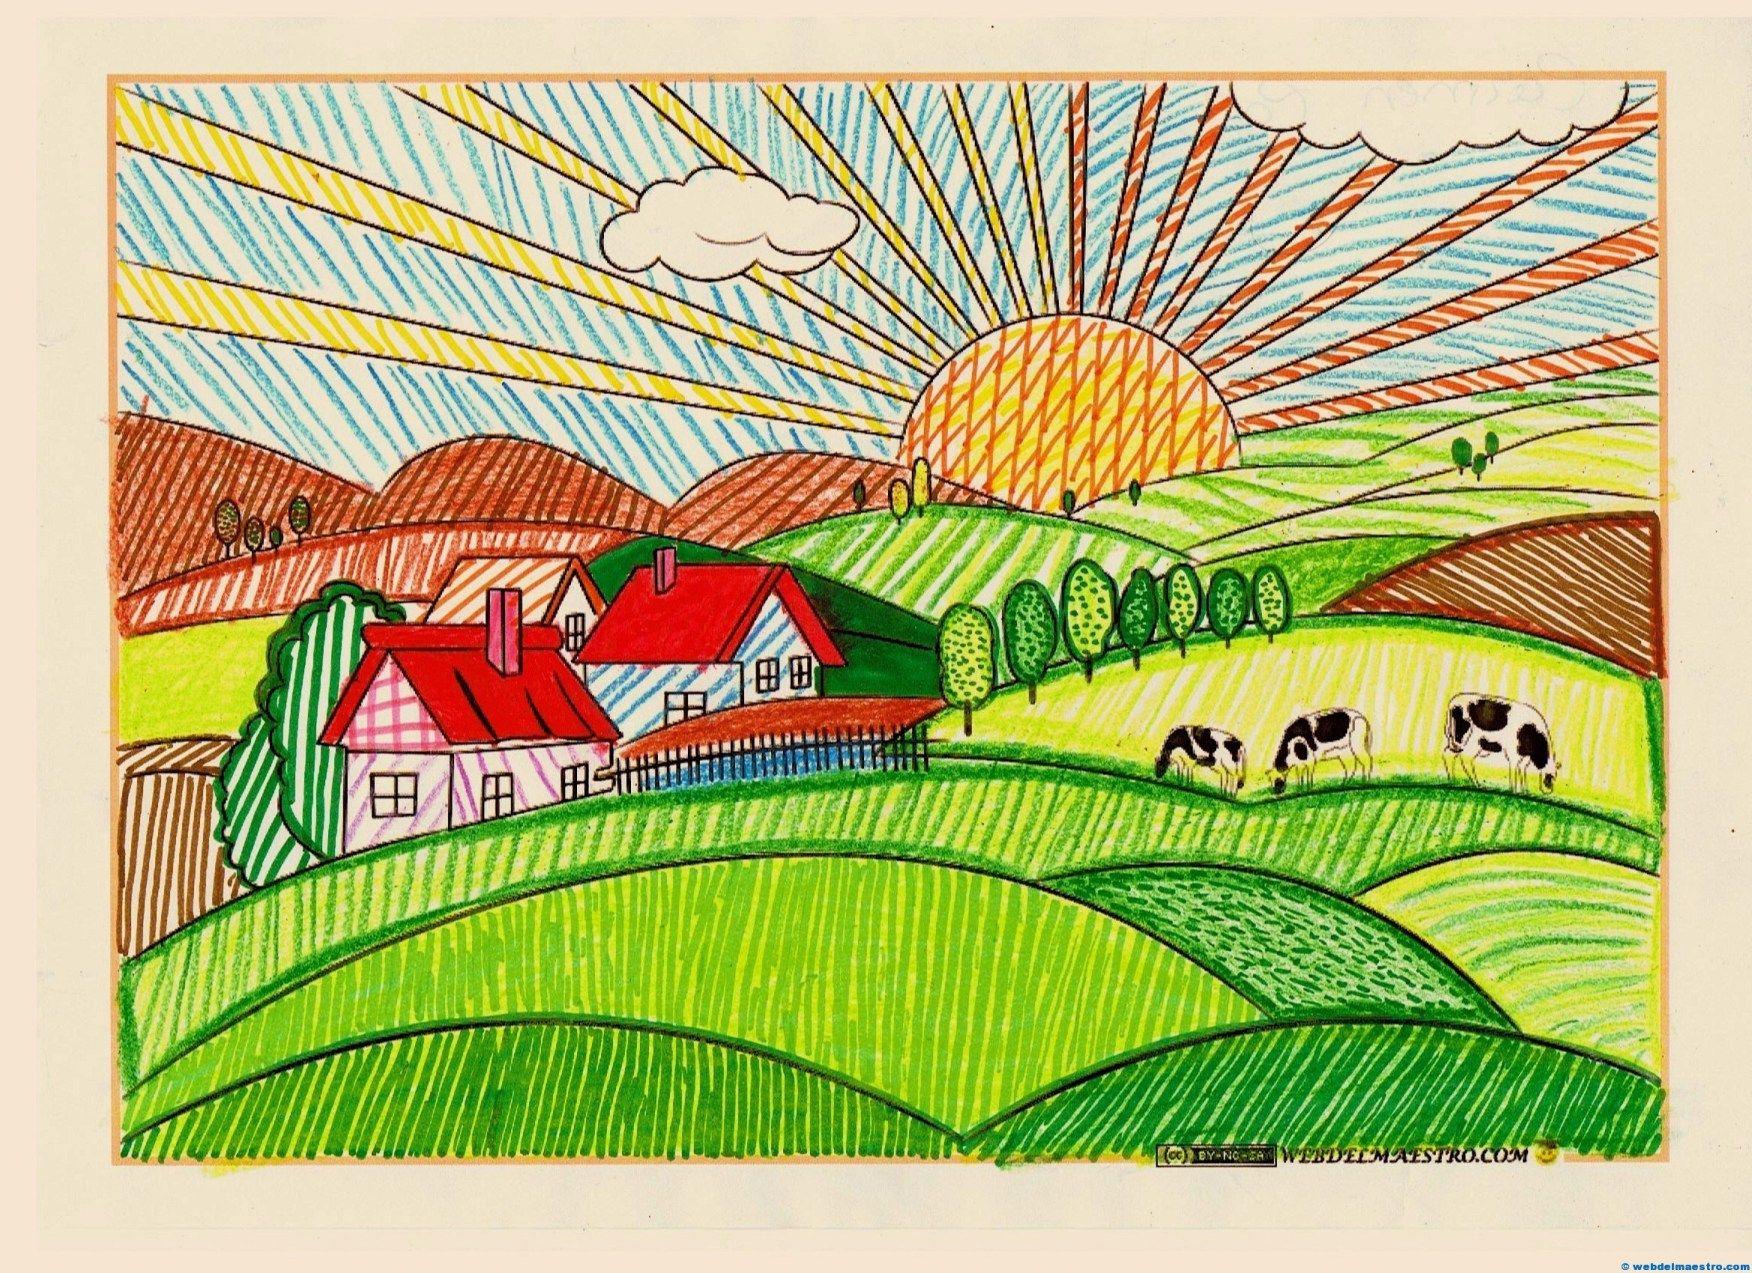 Paisajes Para Pintar Web Del Maestro Paisaje Para Pintar Dibujos Para Colorear Paisajes Dibujos Para Pintar Paisajes